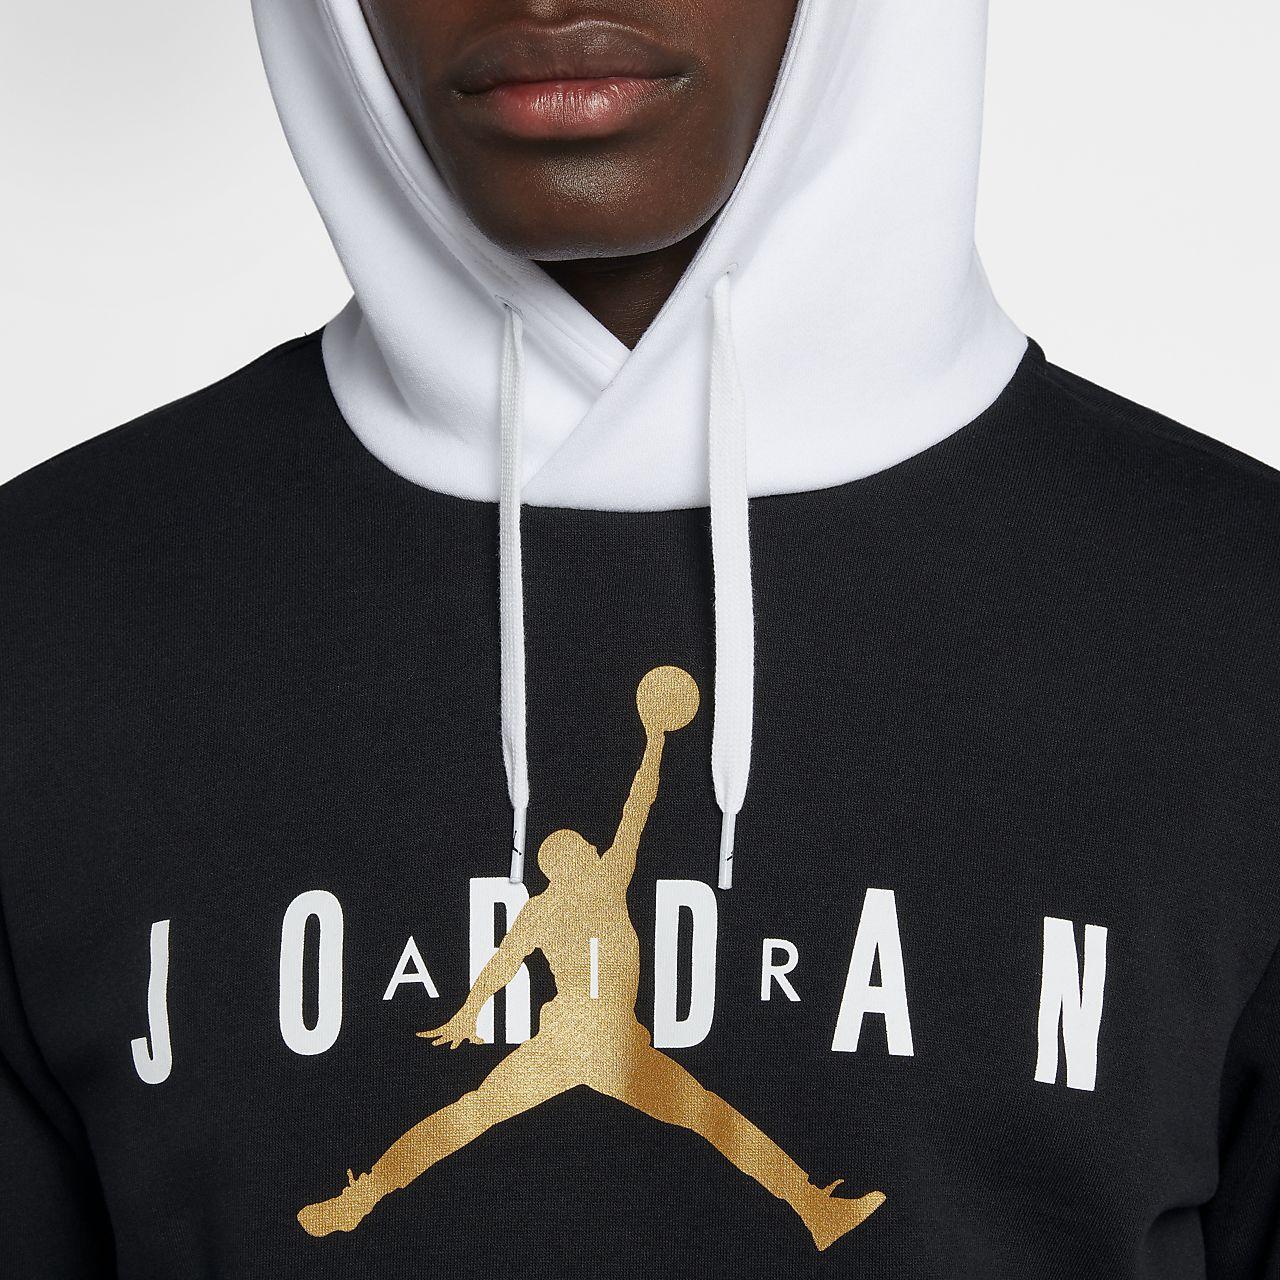 990e133adcef20 Jordan Jumpman Air Men s Fleece Pullover Hoodie. Nike.com